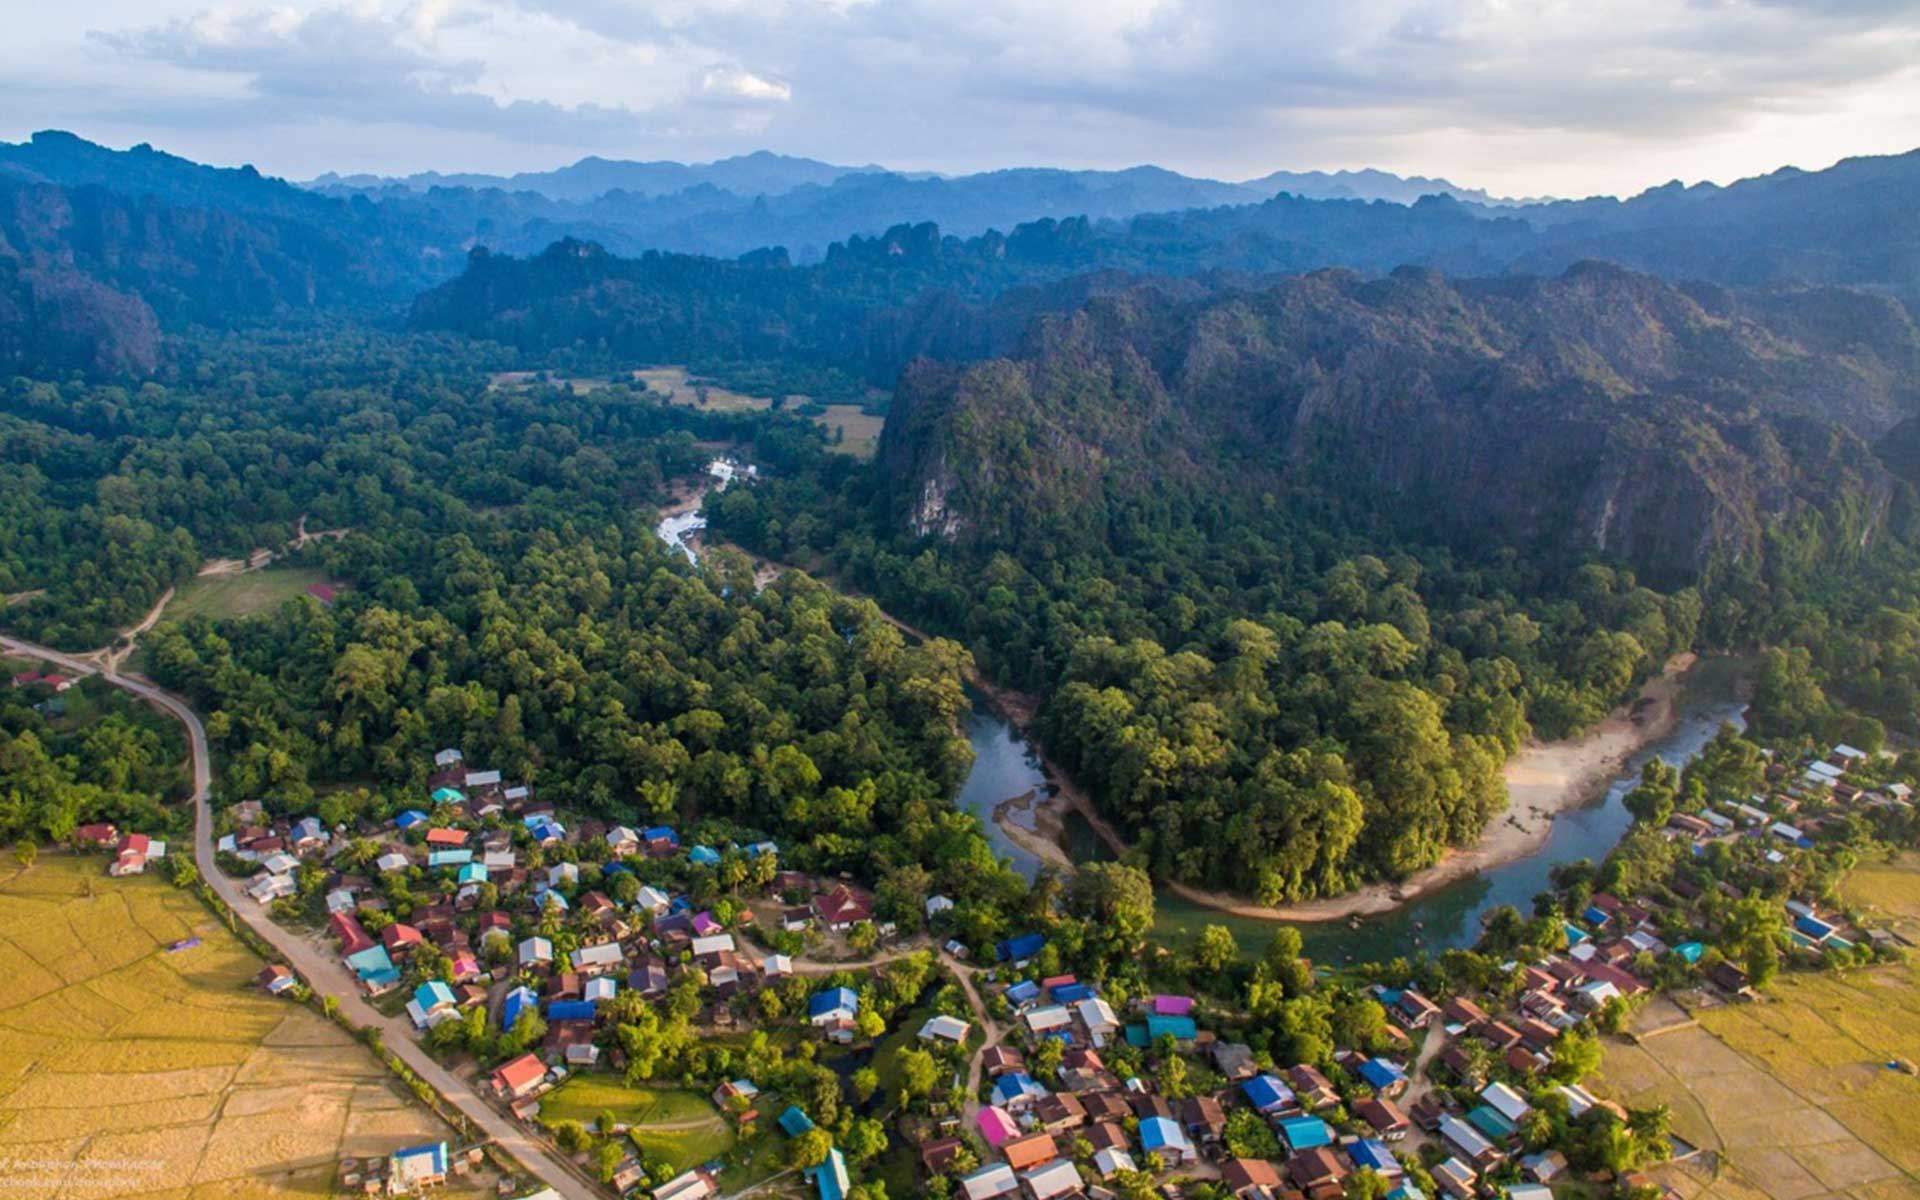 LAOS Laotravel 8 Laos Travel